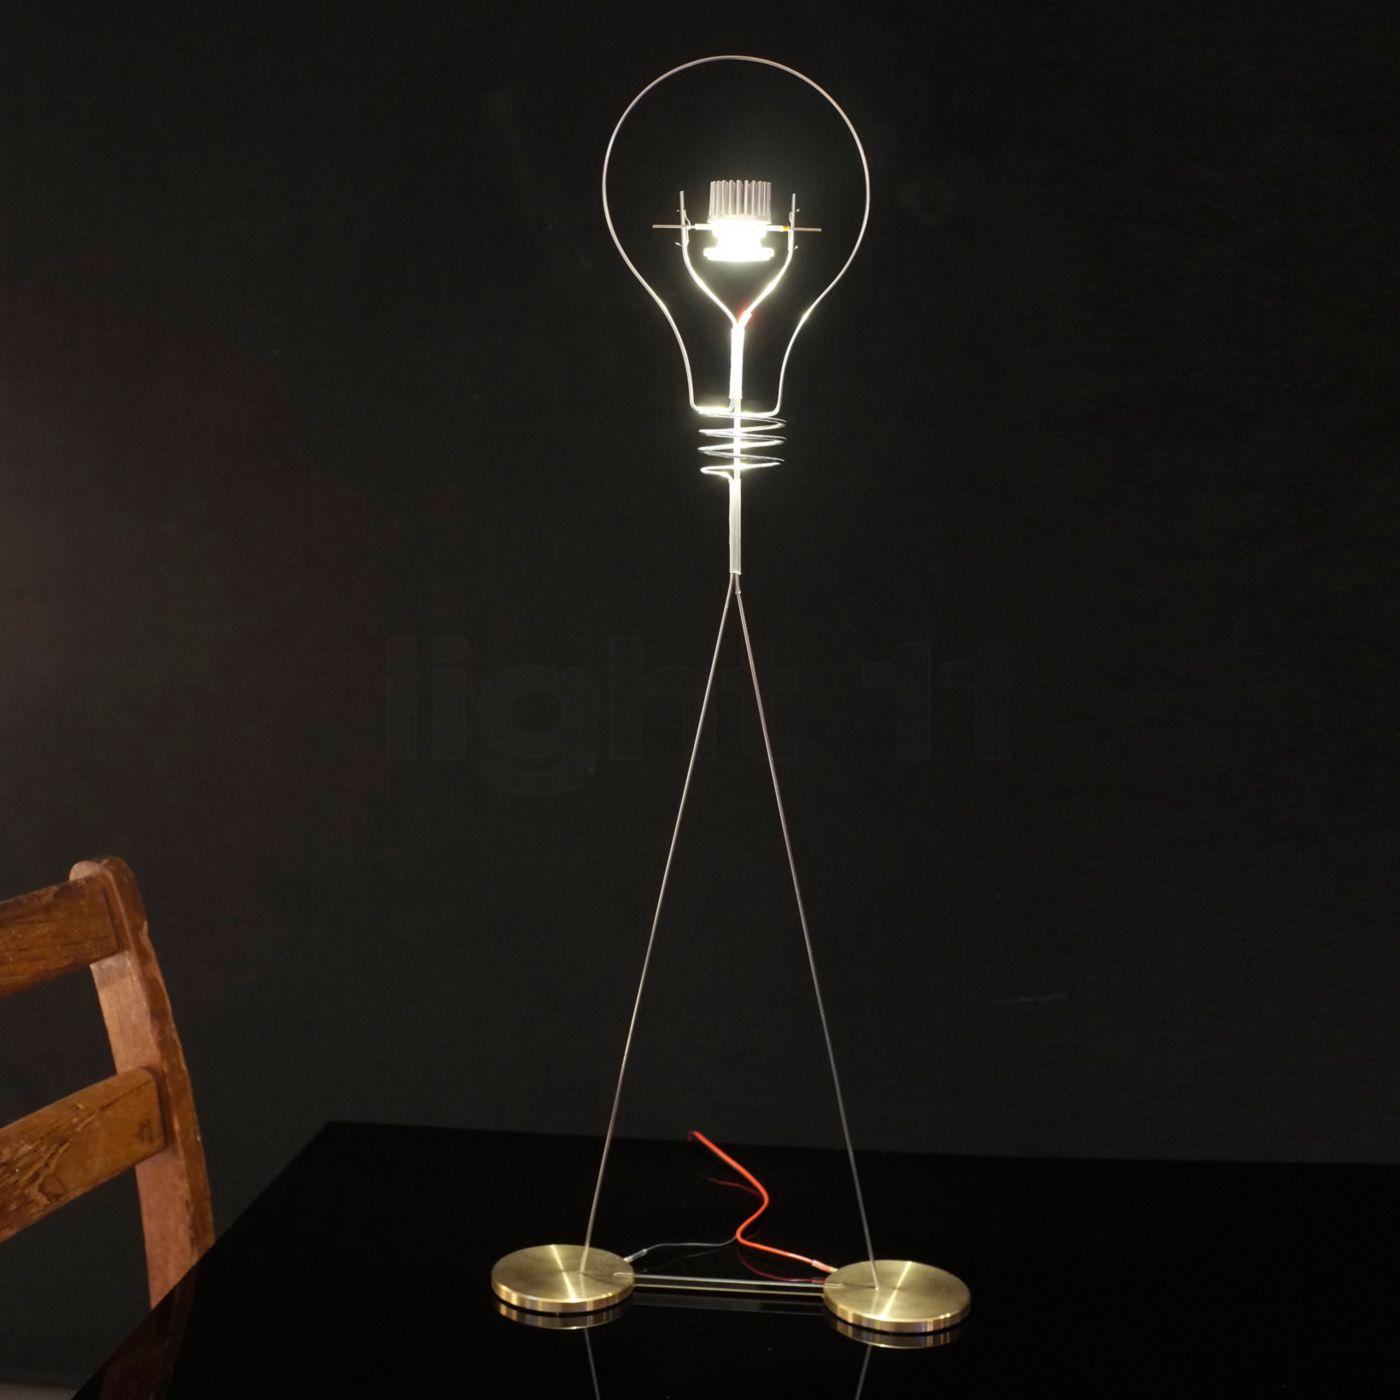 Buy ingo maurer walking bulb table lamp led at light11 aloadofball Images